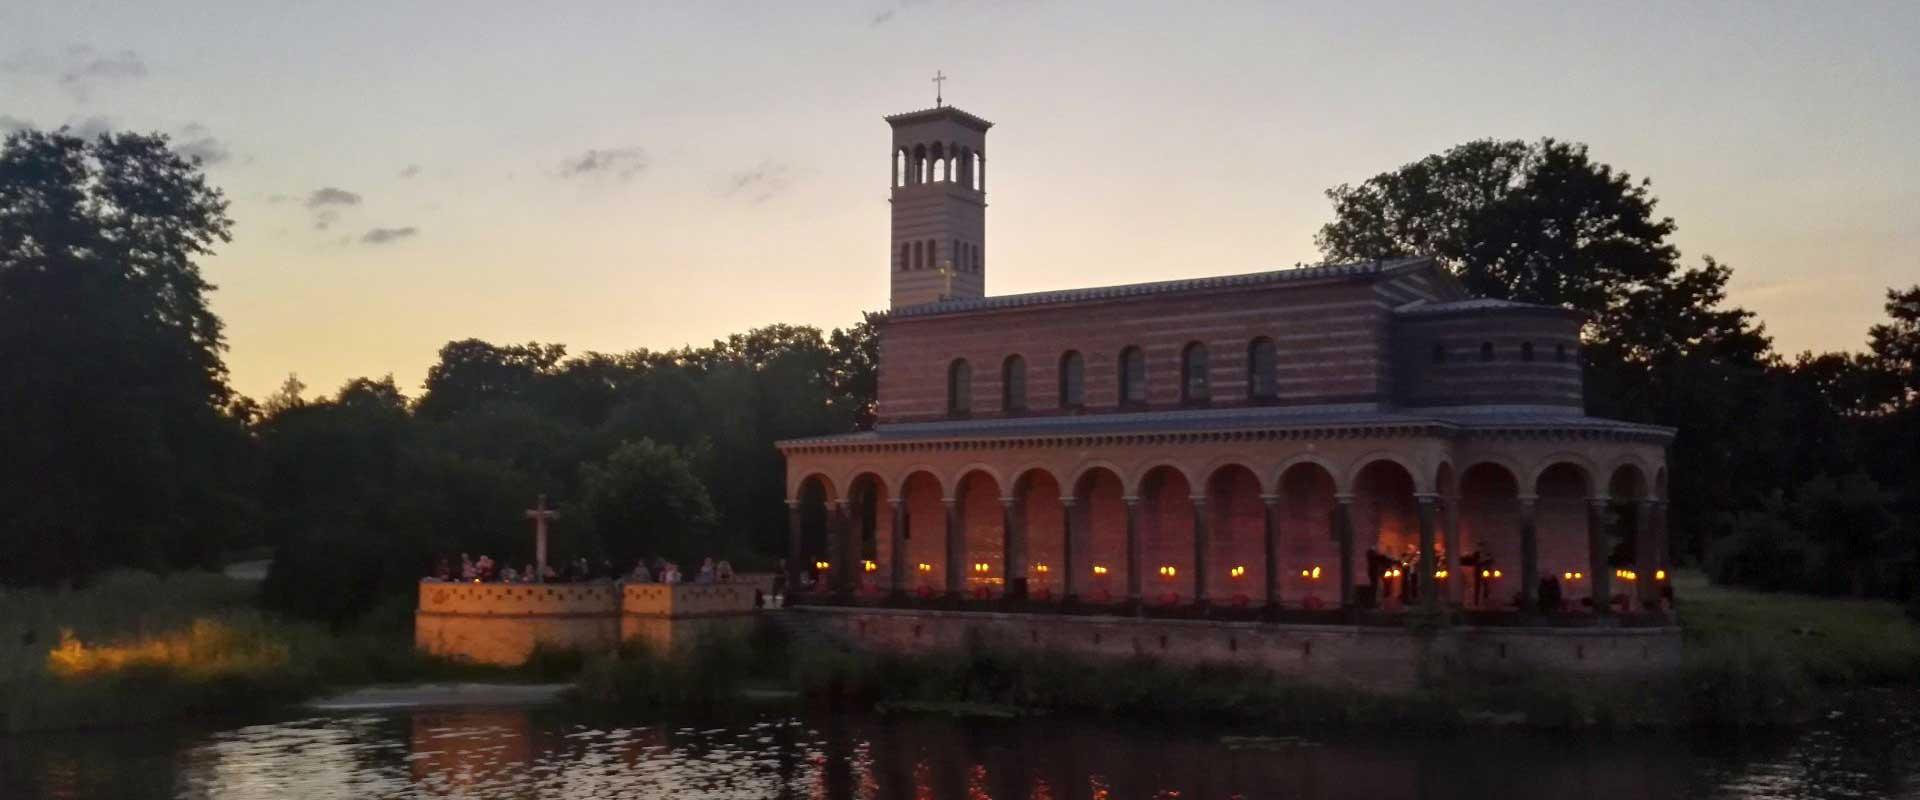 Reiseservice Potsdam